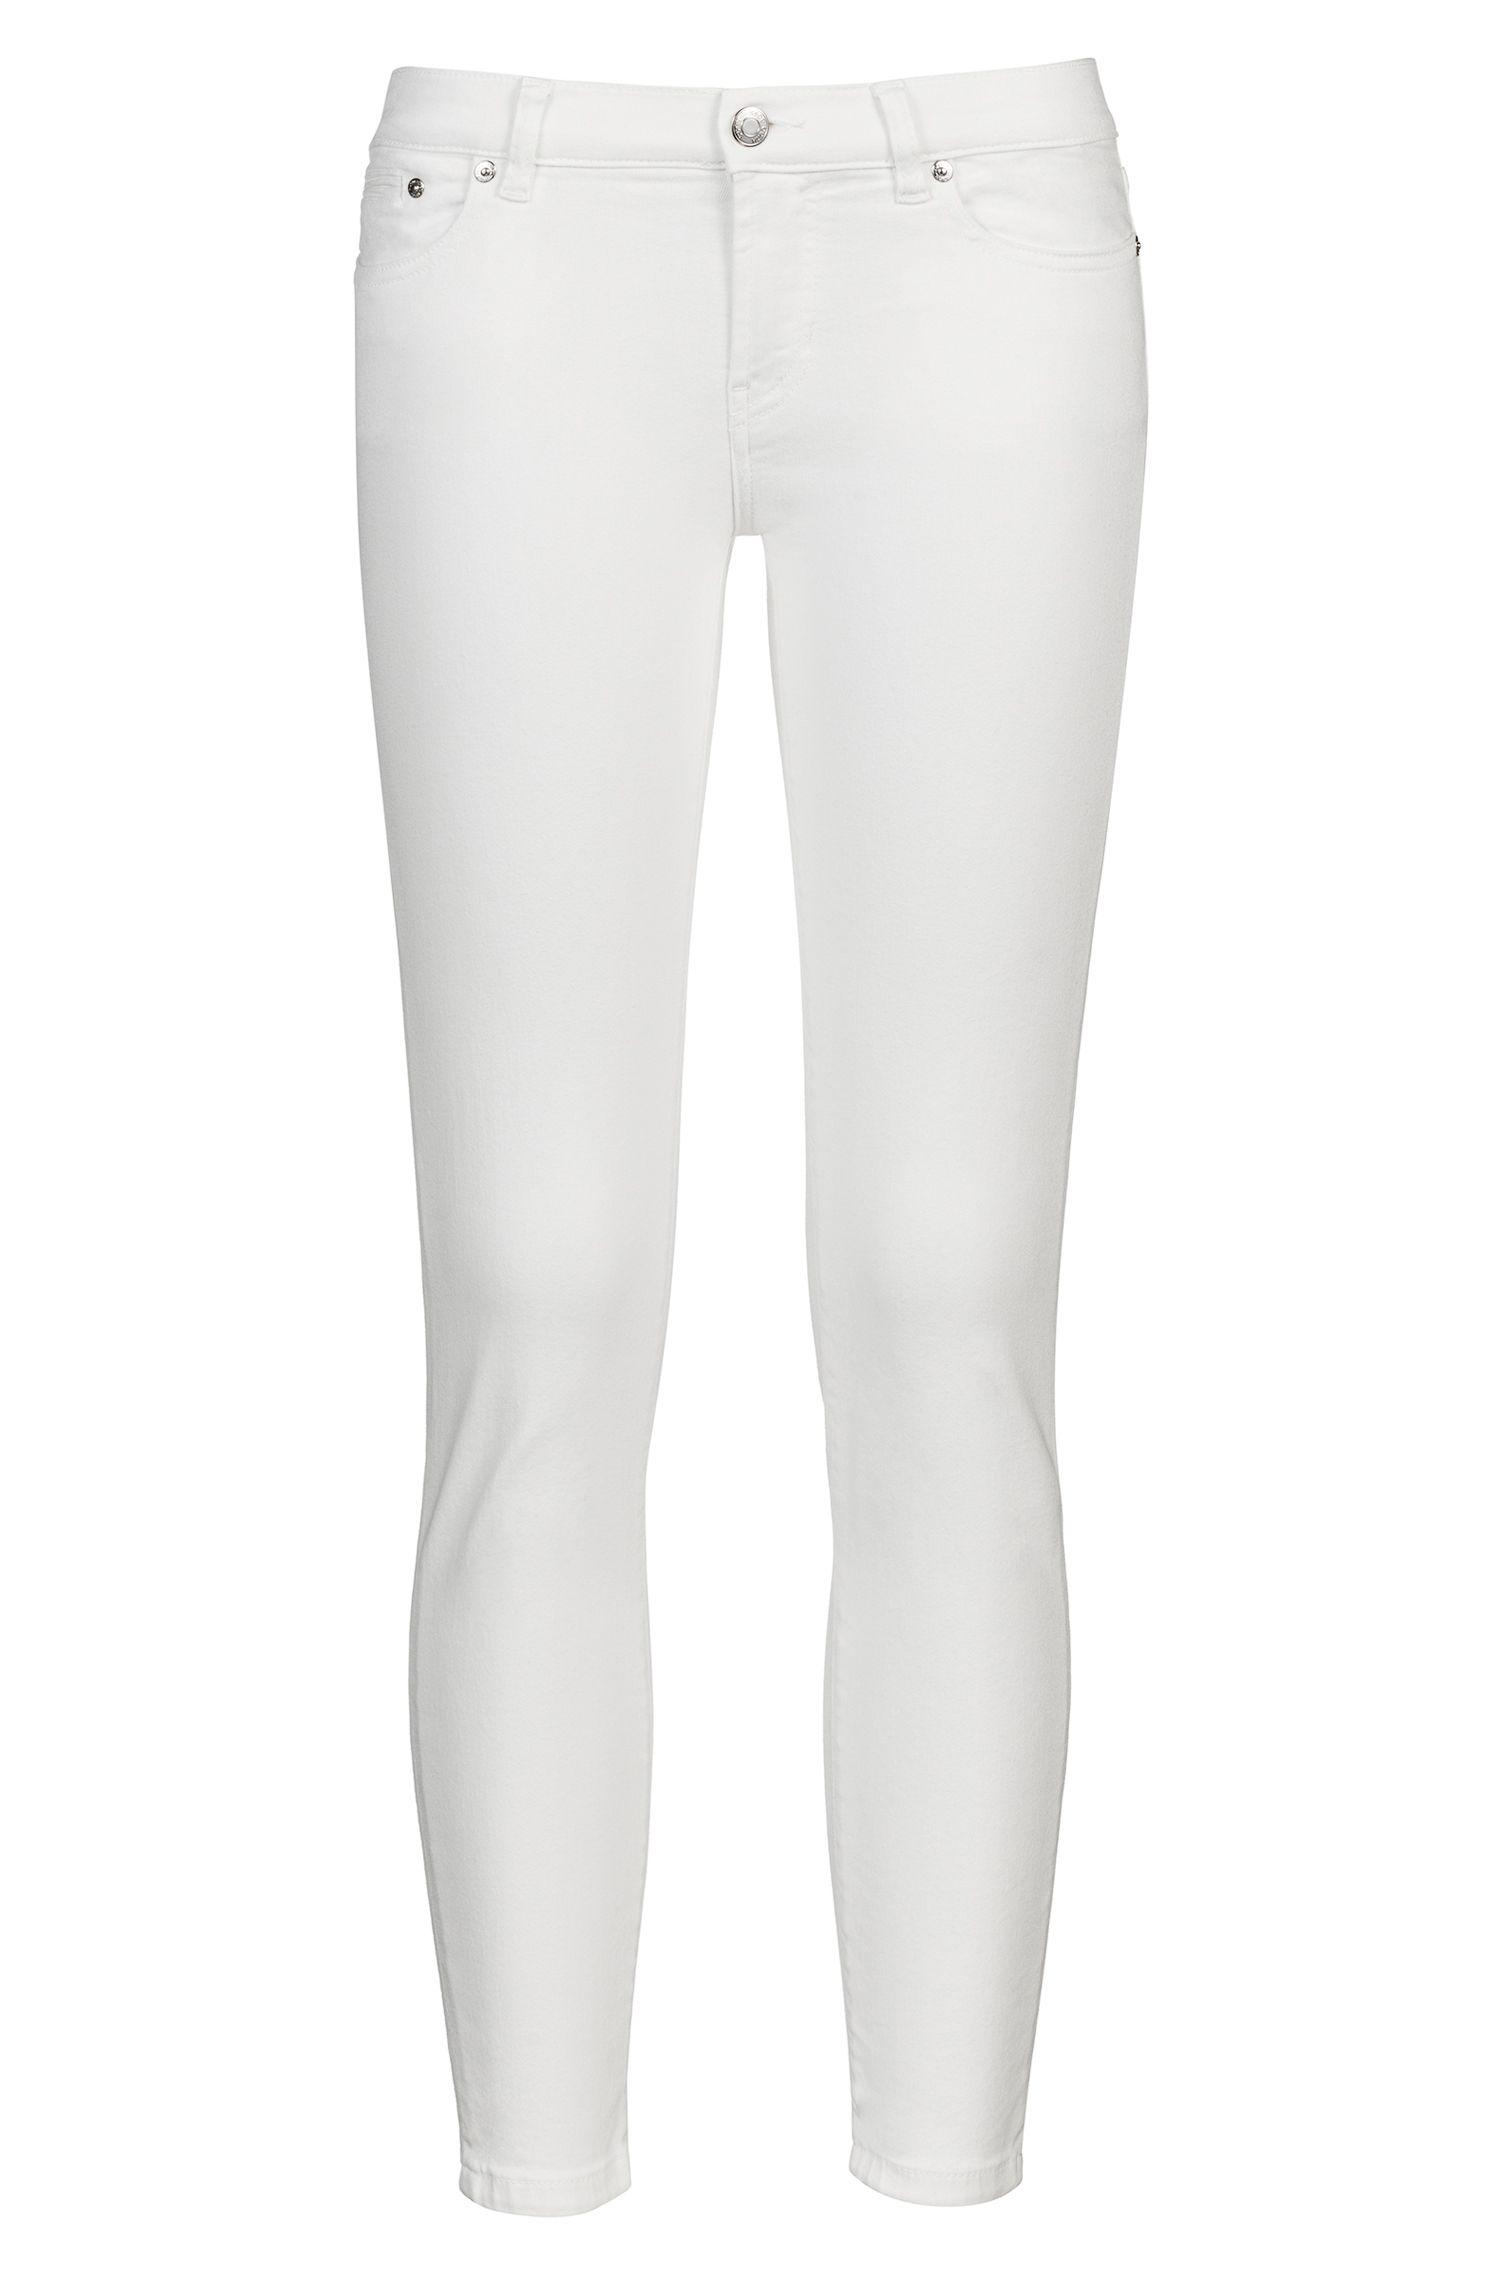 Hugo Boss - Skinny-Fit Jeans mit Reißverschlüssen hinten am Saum - 1